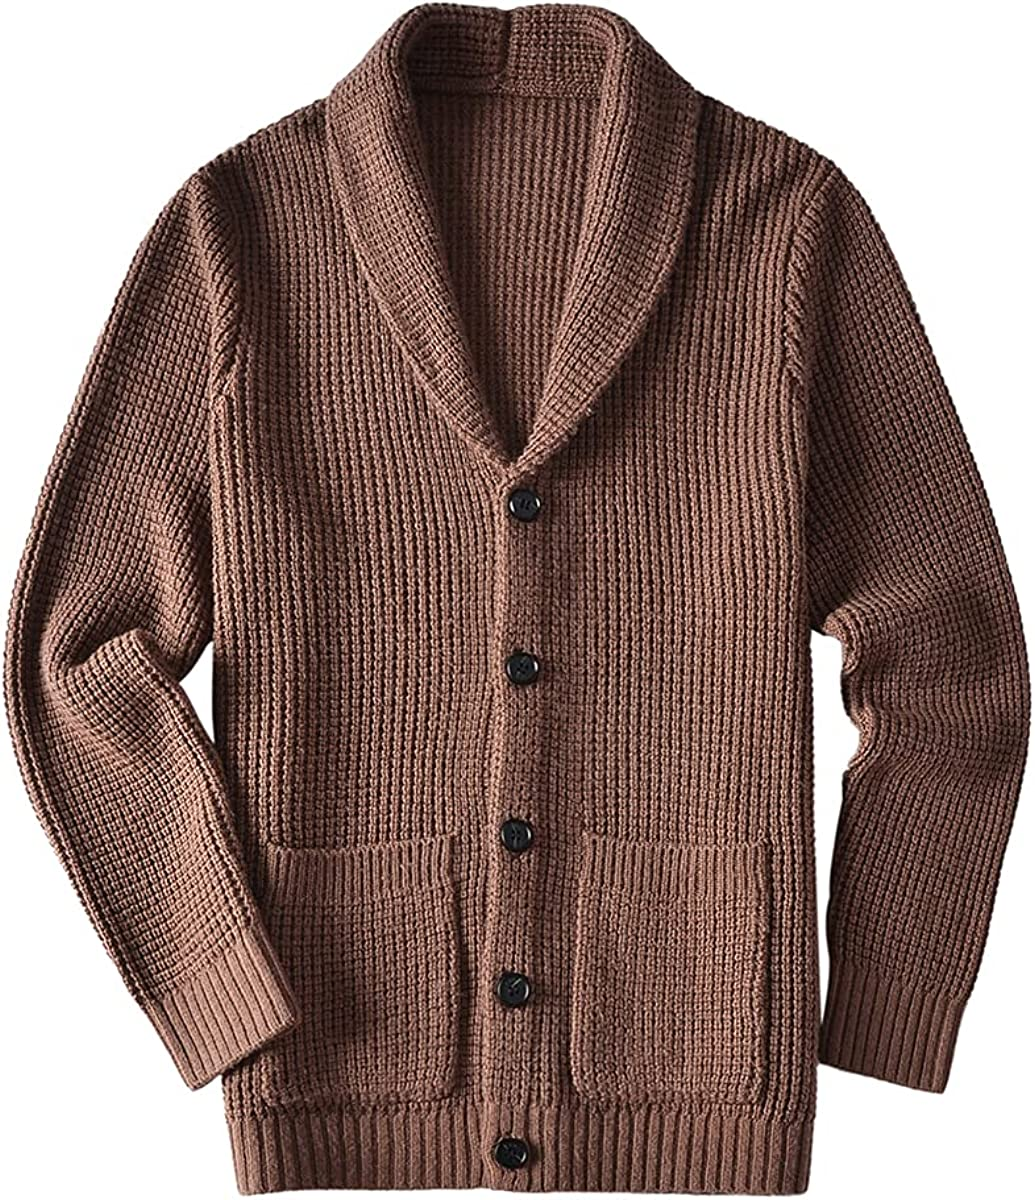 ZHILI Men's Casual Slim Thick Knitted Shawl 1 year warranty Cardigan Swea Max 60% OFF Collar